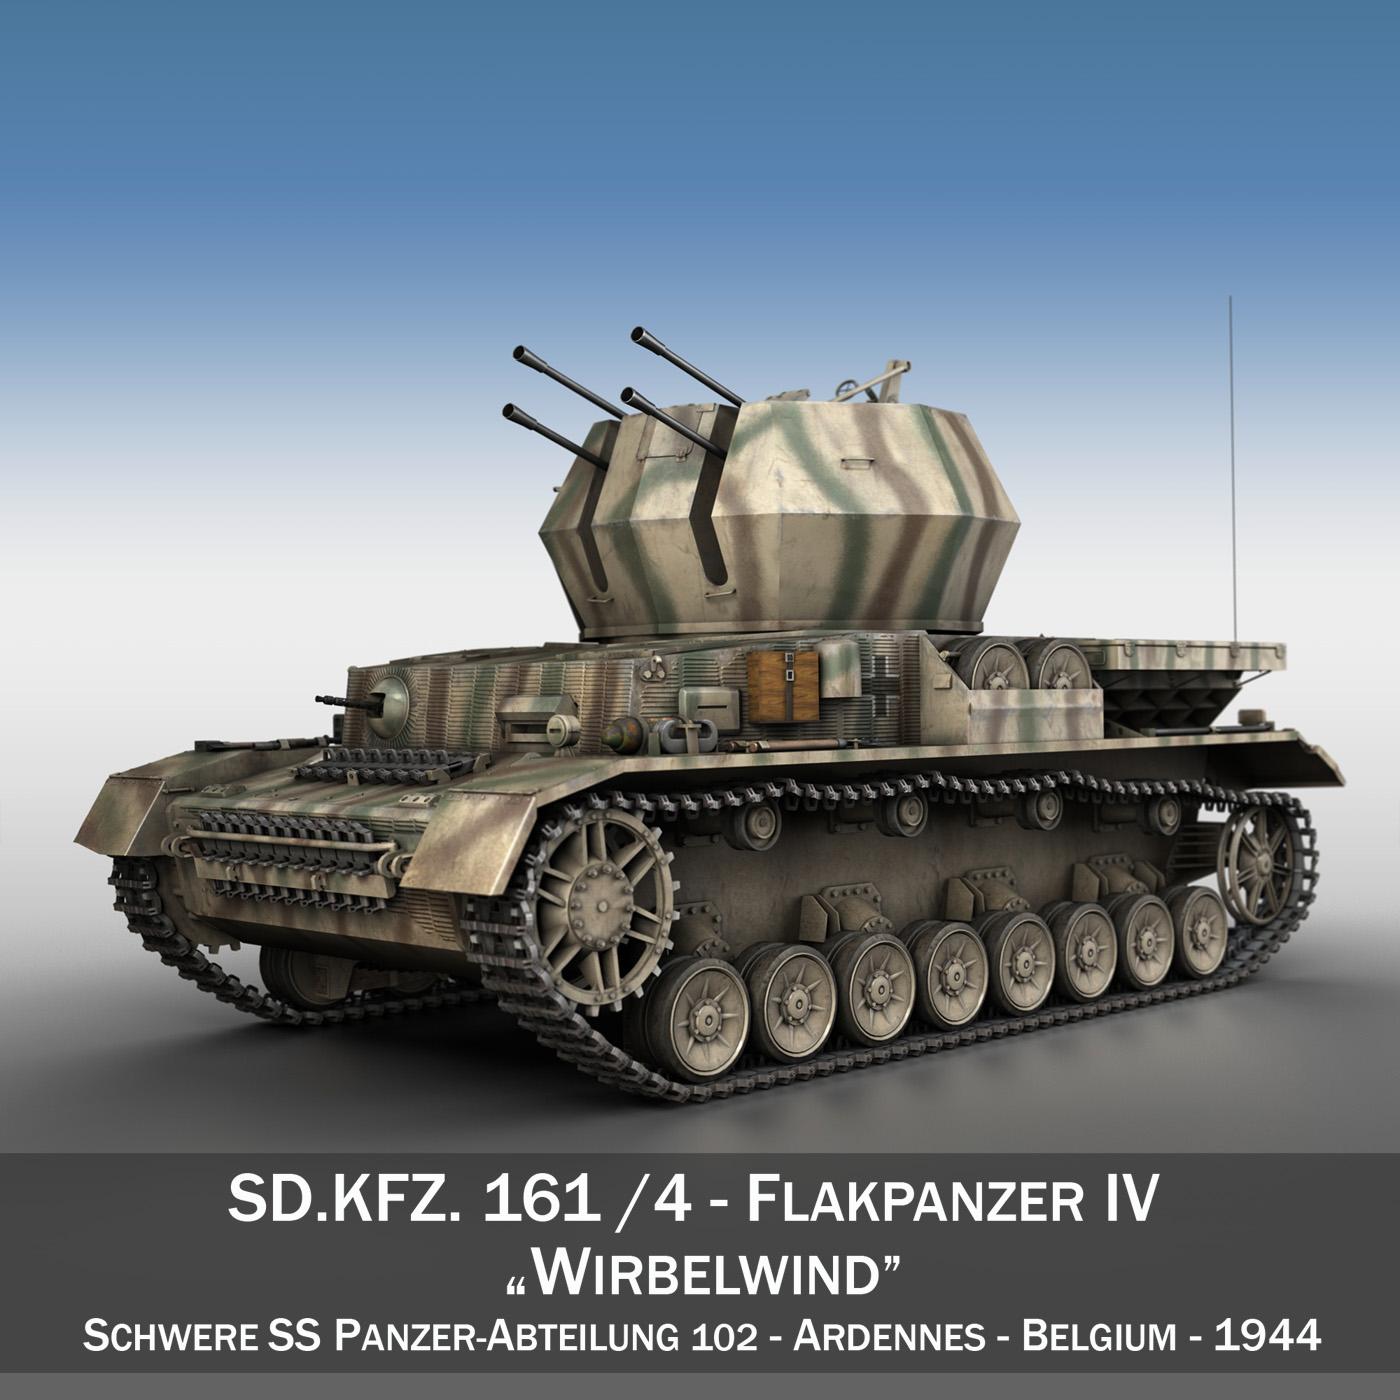 flakpanzer iv - wirbelwind - s.ss-pzabt.102 3d modell 3ds fbx lwo lws lws obj c4d 265563